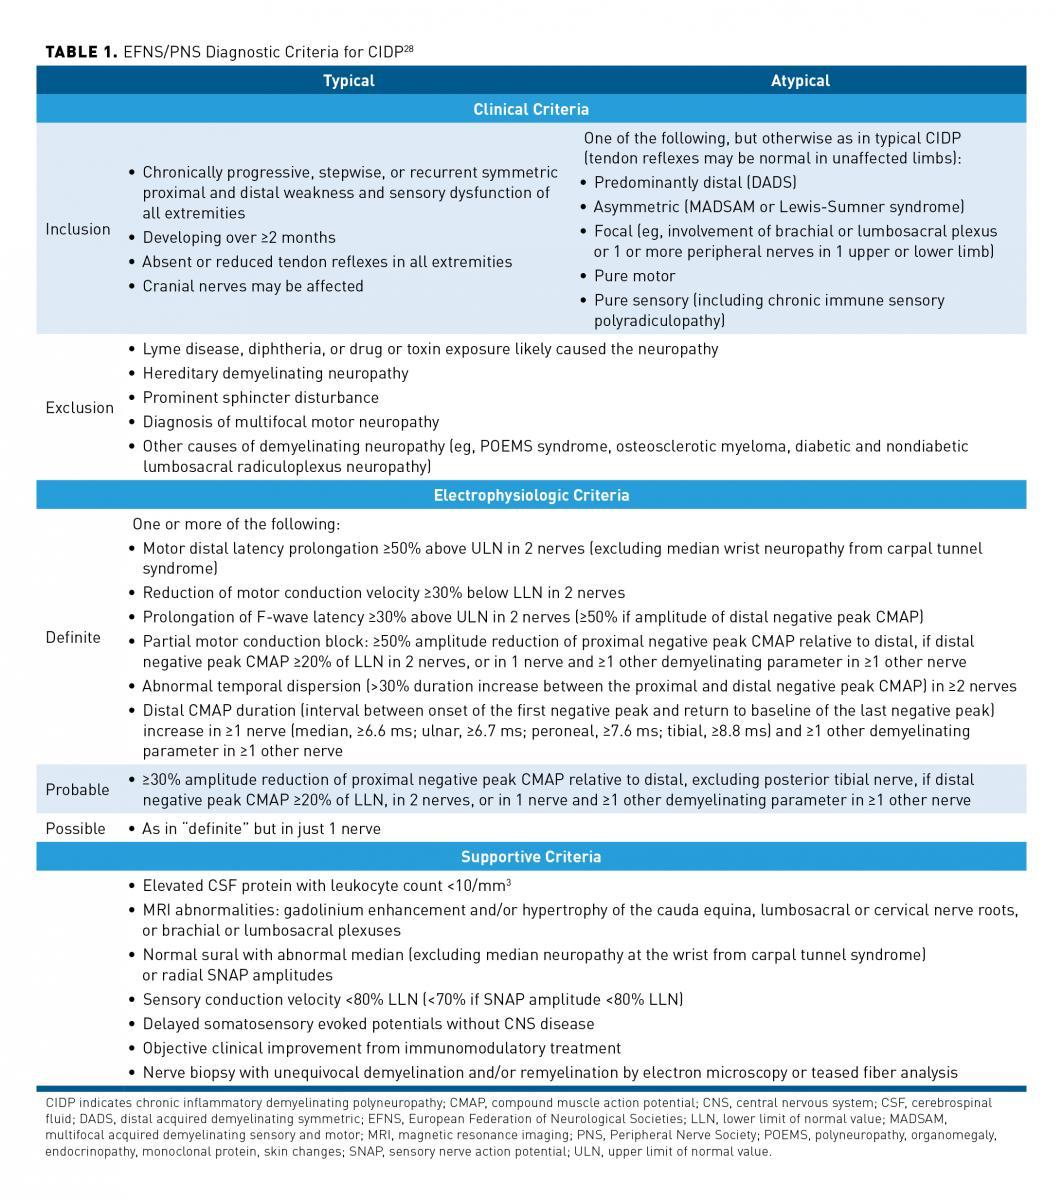 Chronic Inflammatory Demyelinating Polyneuropathy: Considerations